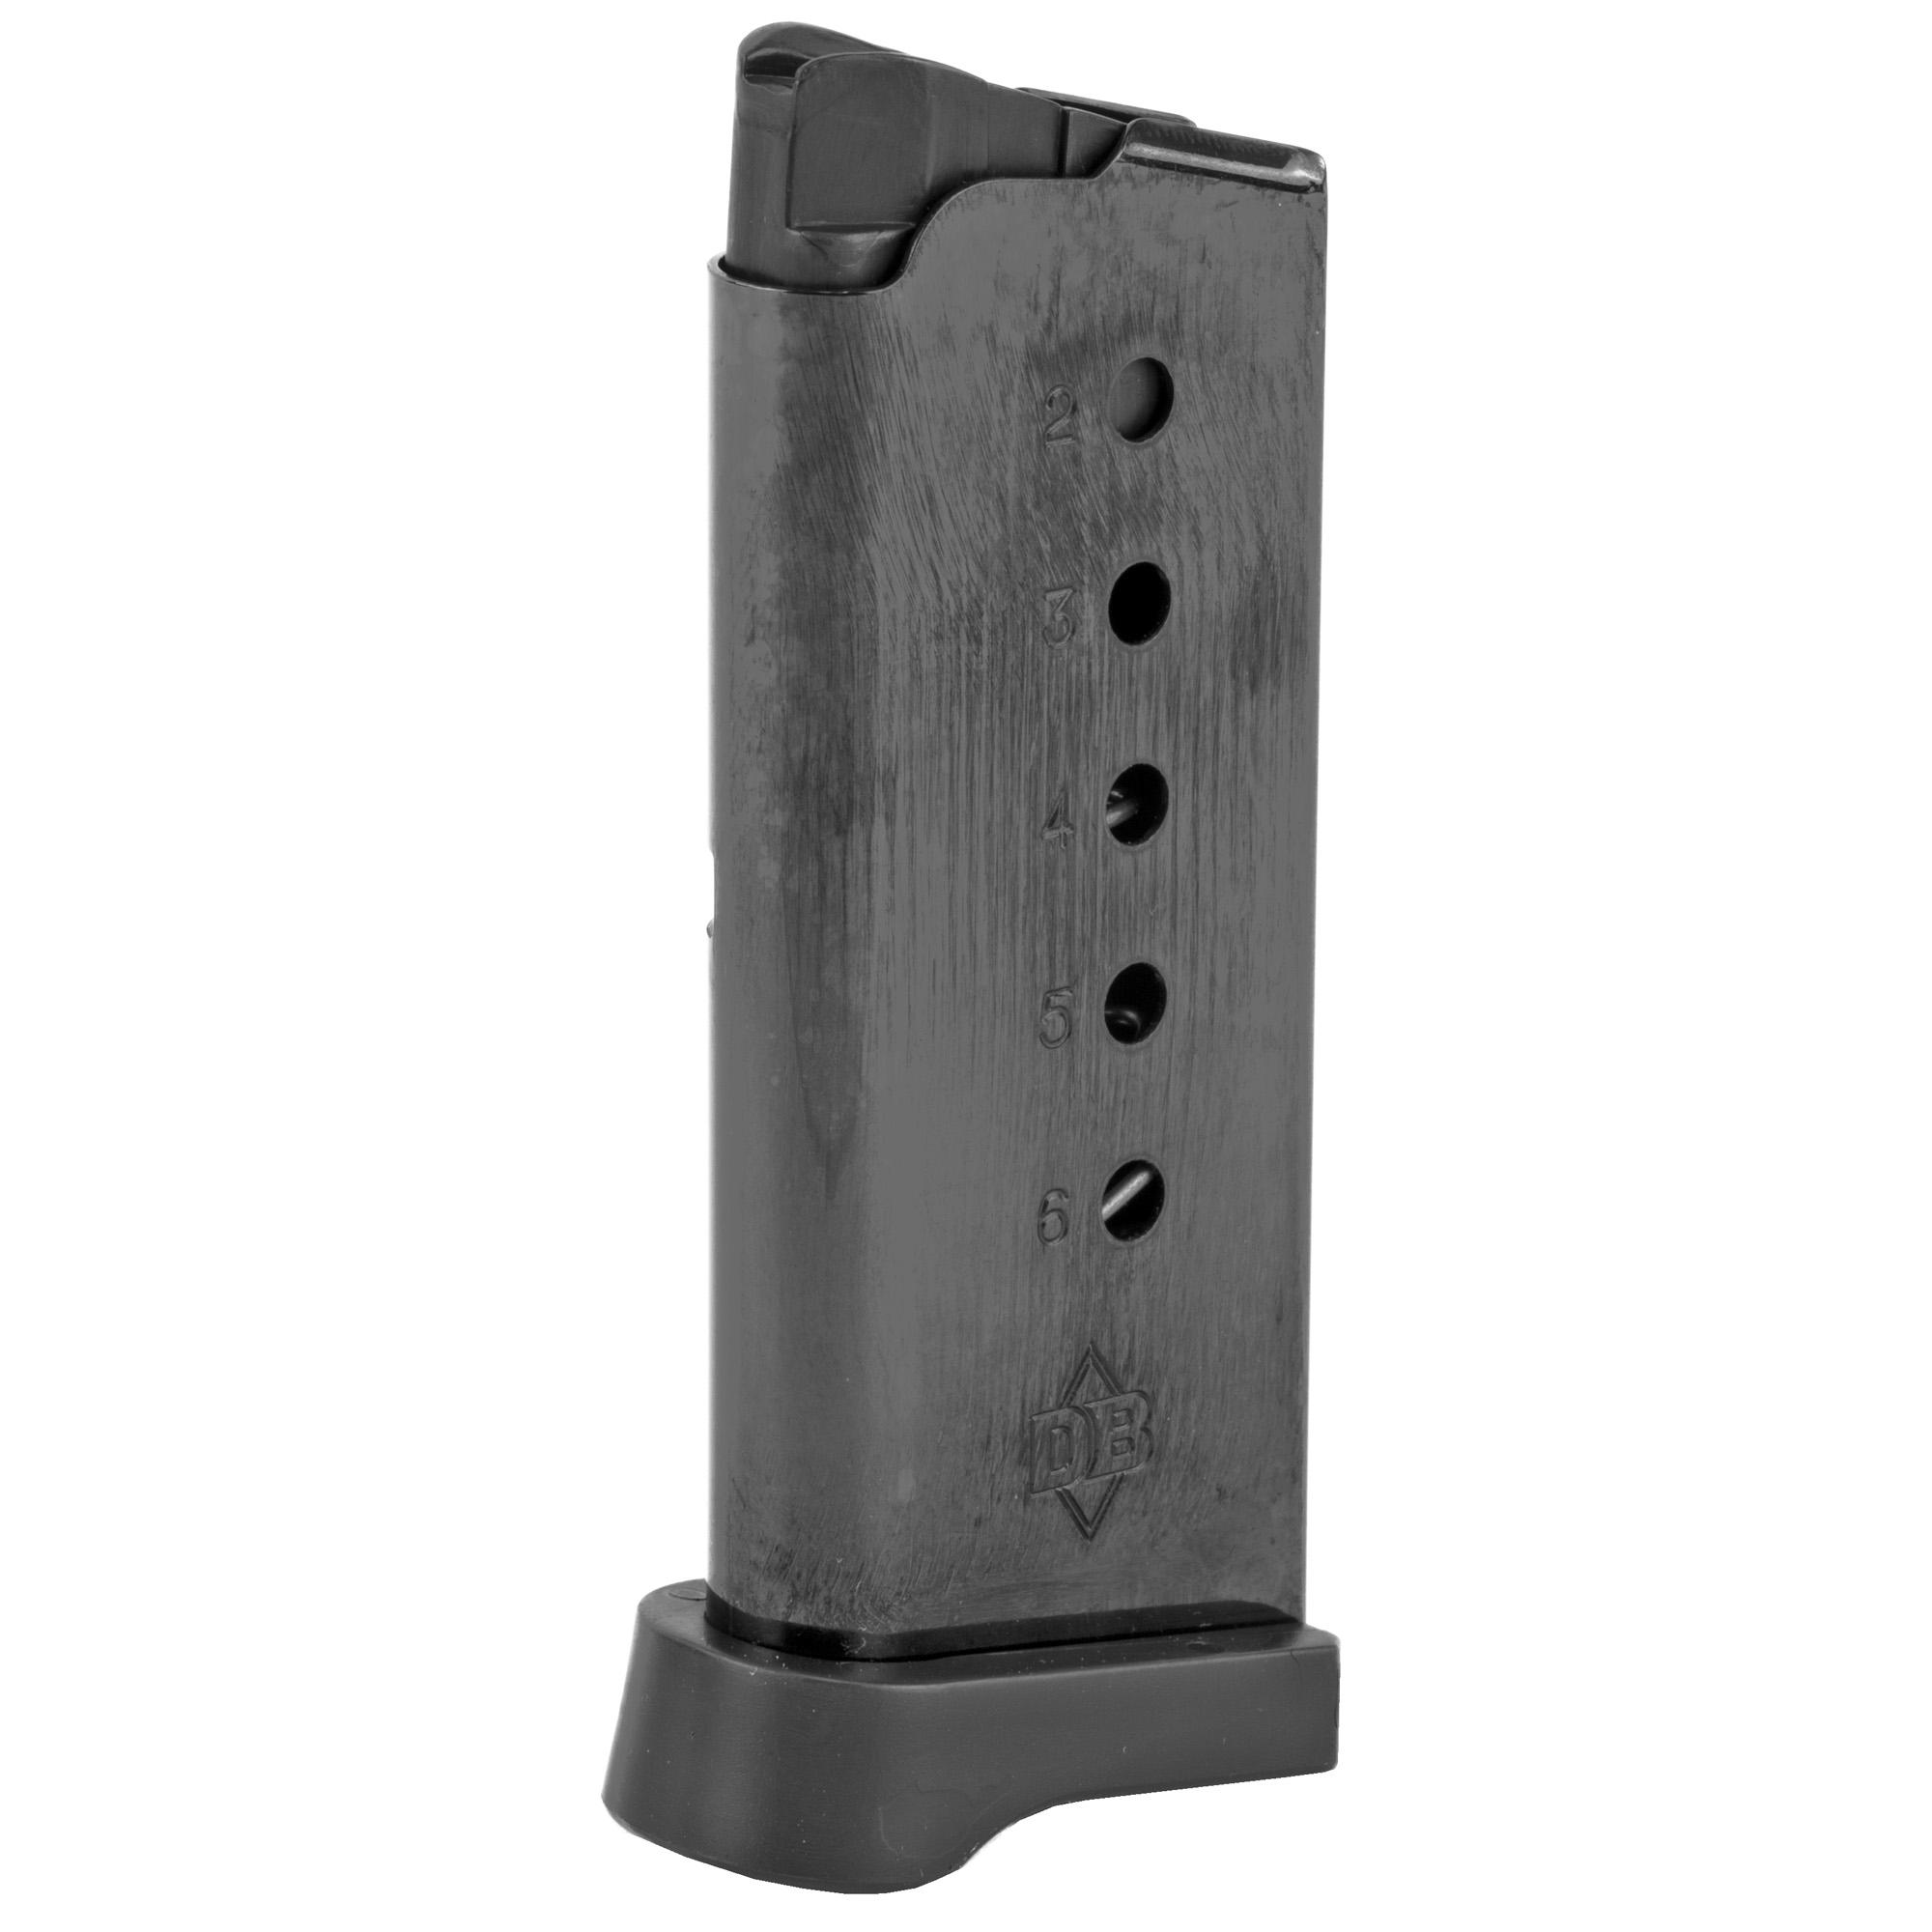 Mag Dbf Db9 9mm 6rd W/flat Bottom